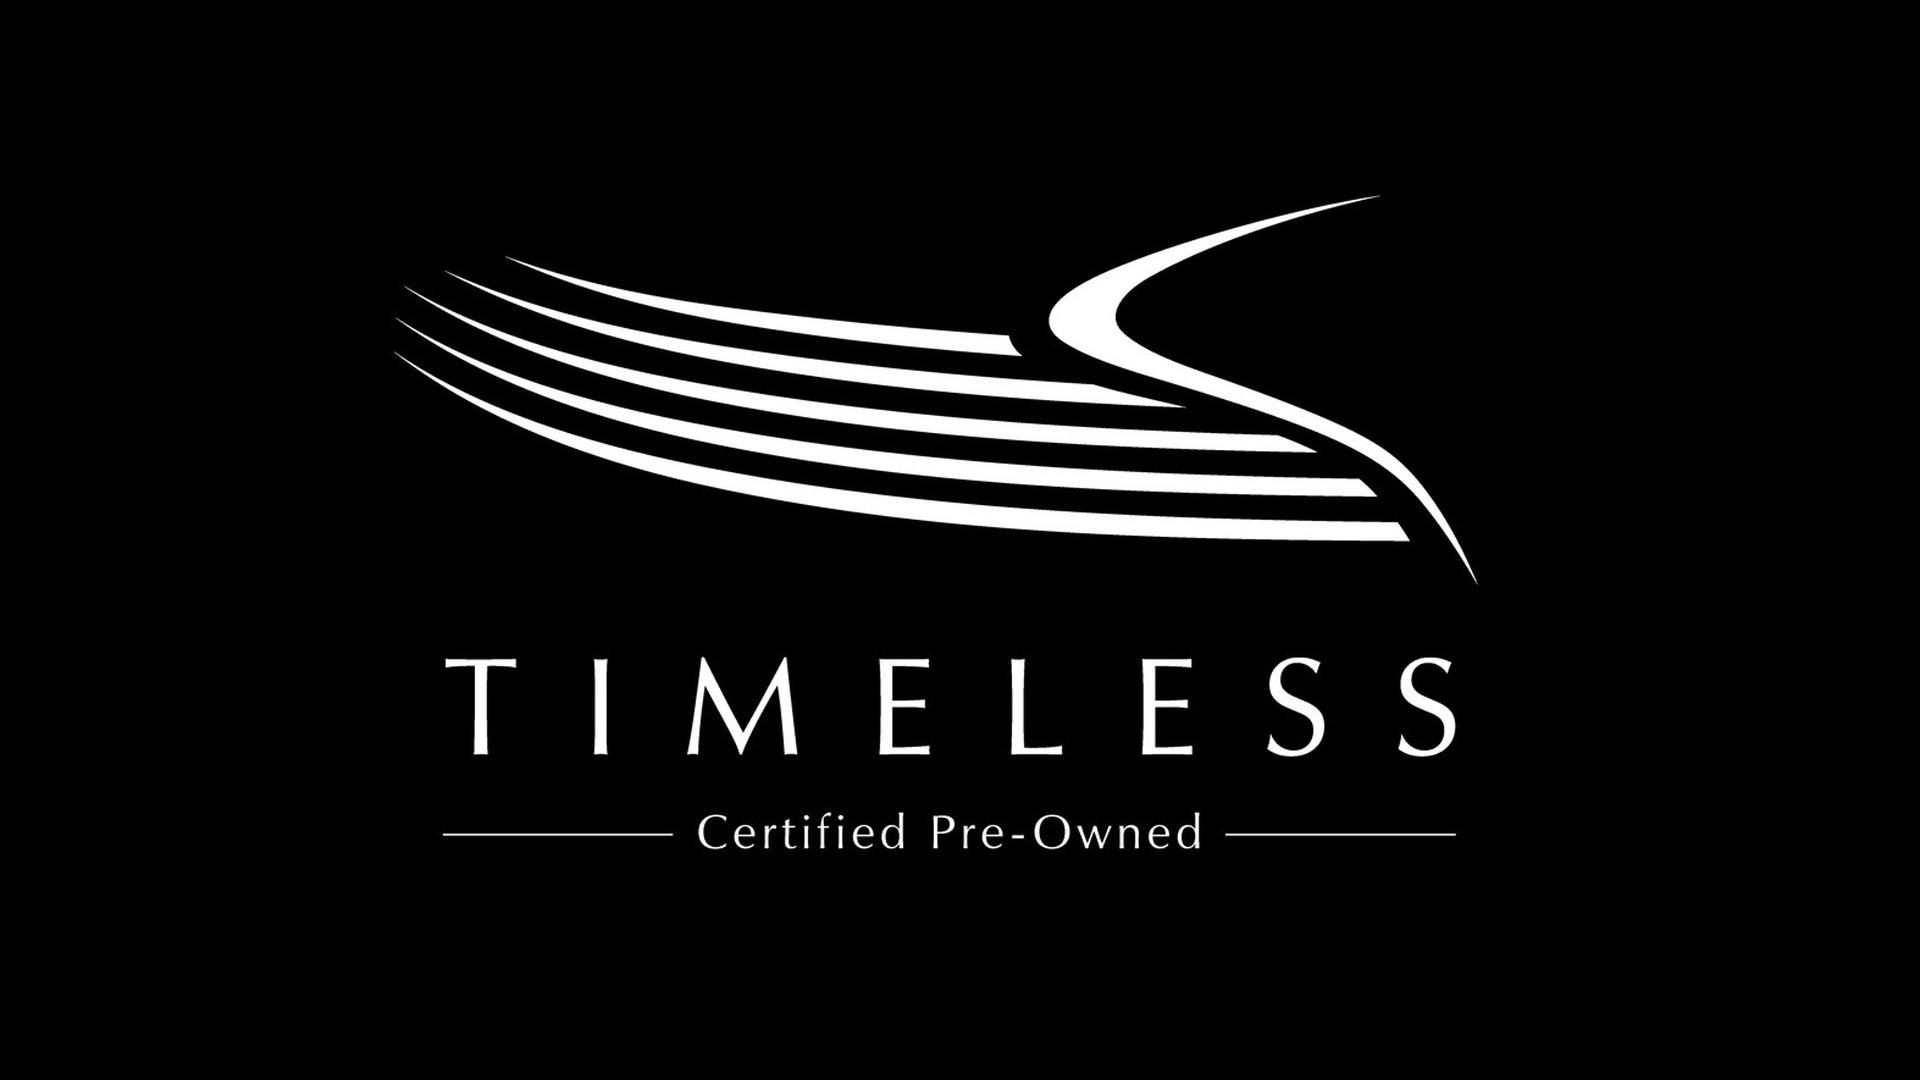 Aston Martin Timeless certified pre-owned program